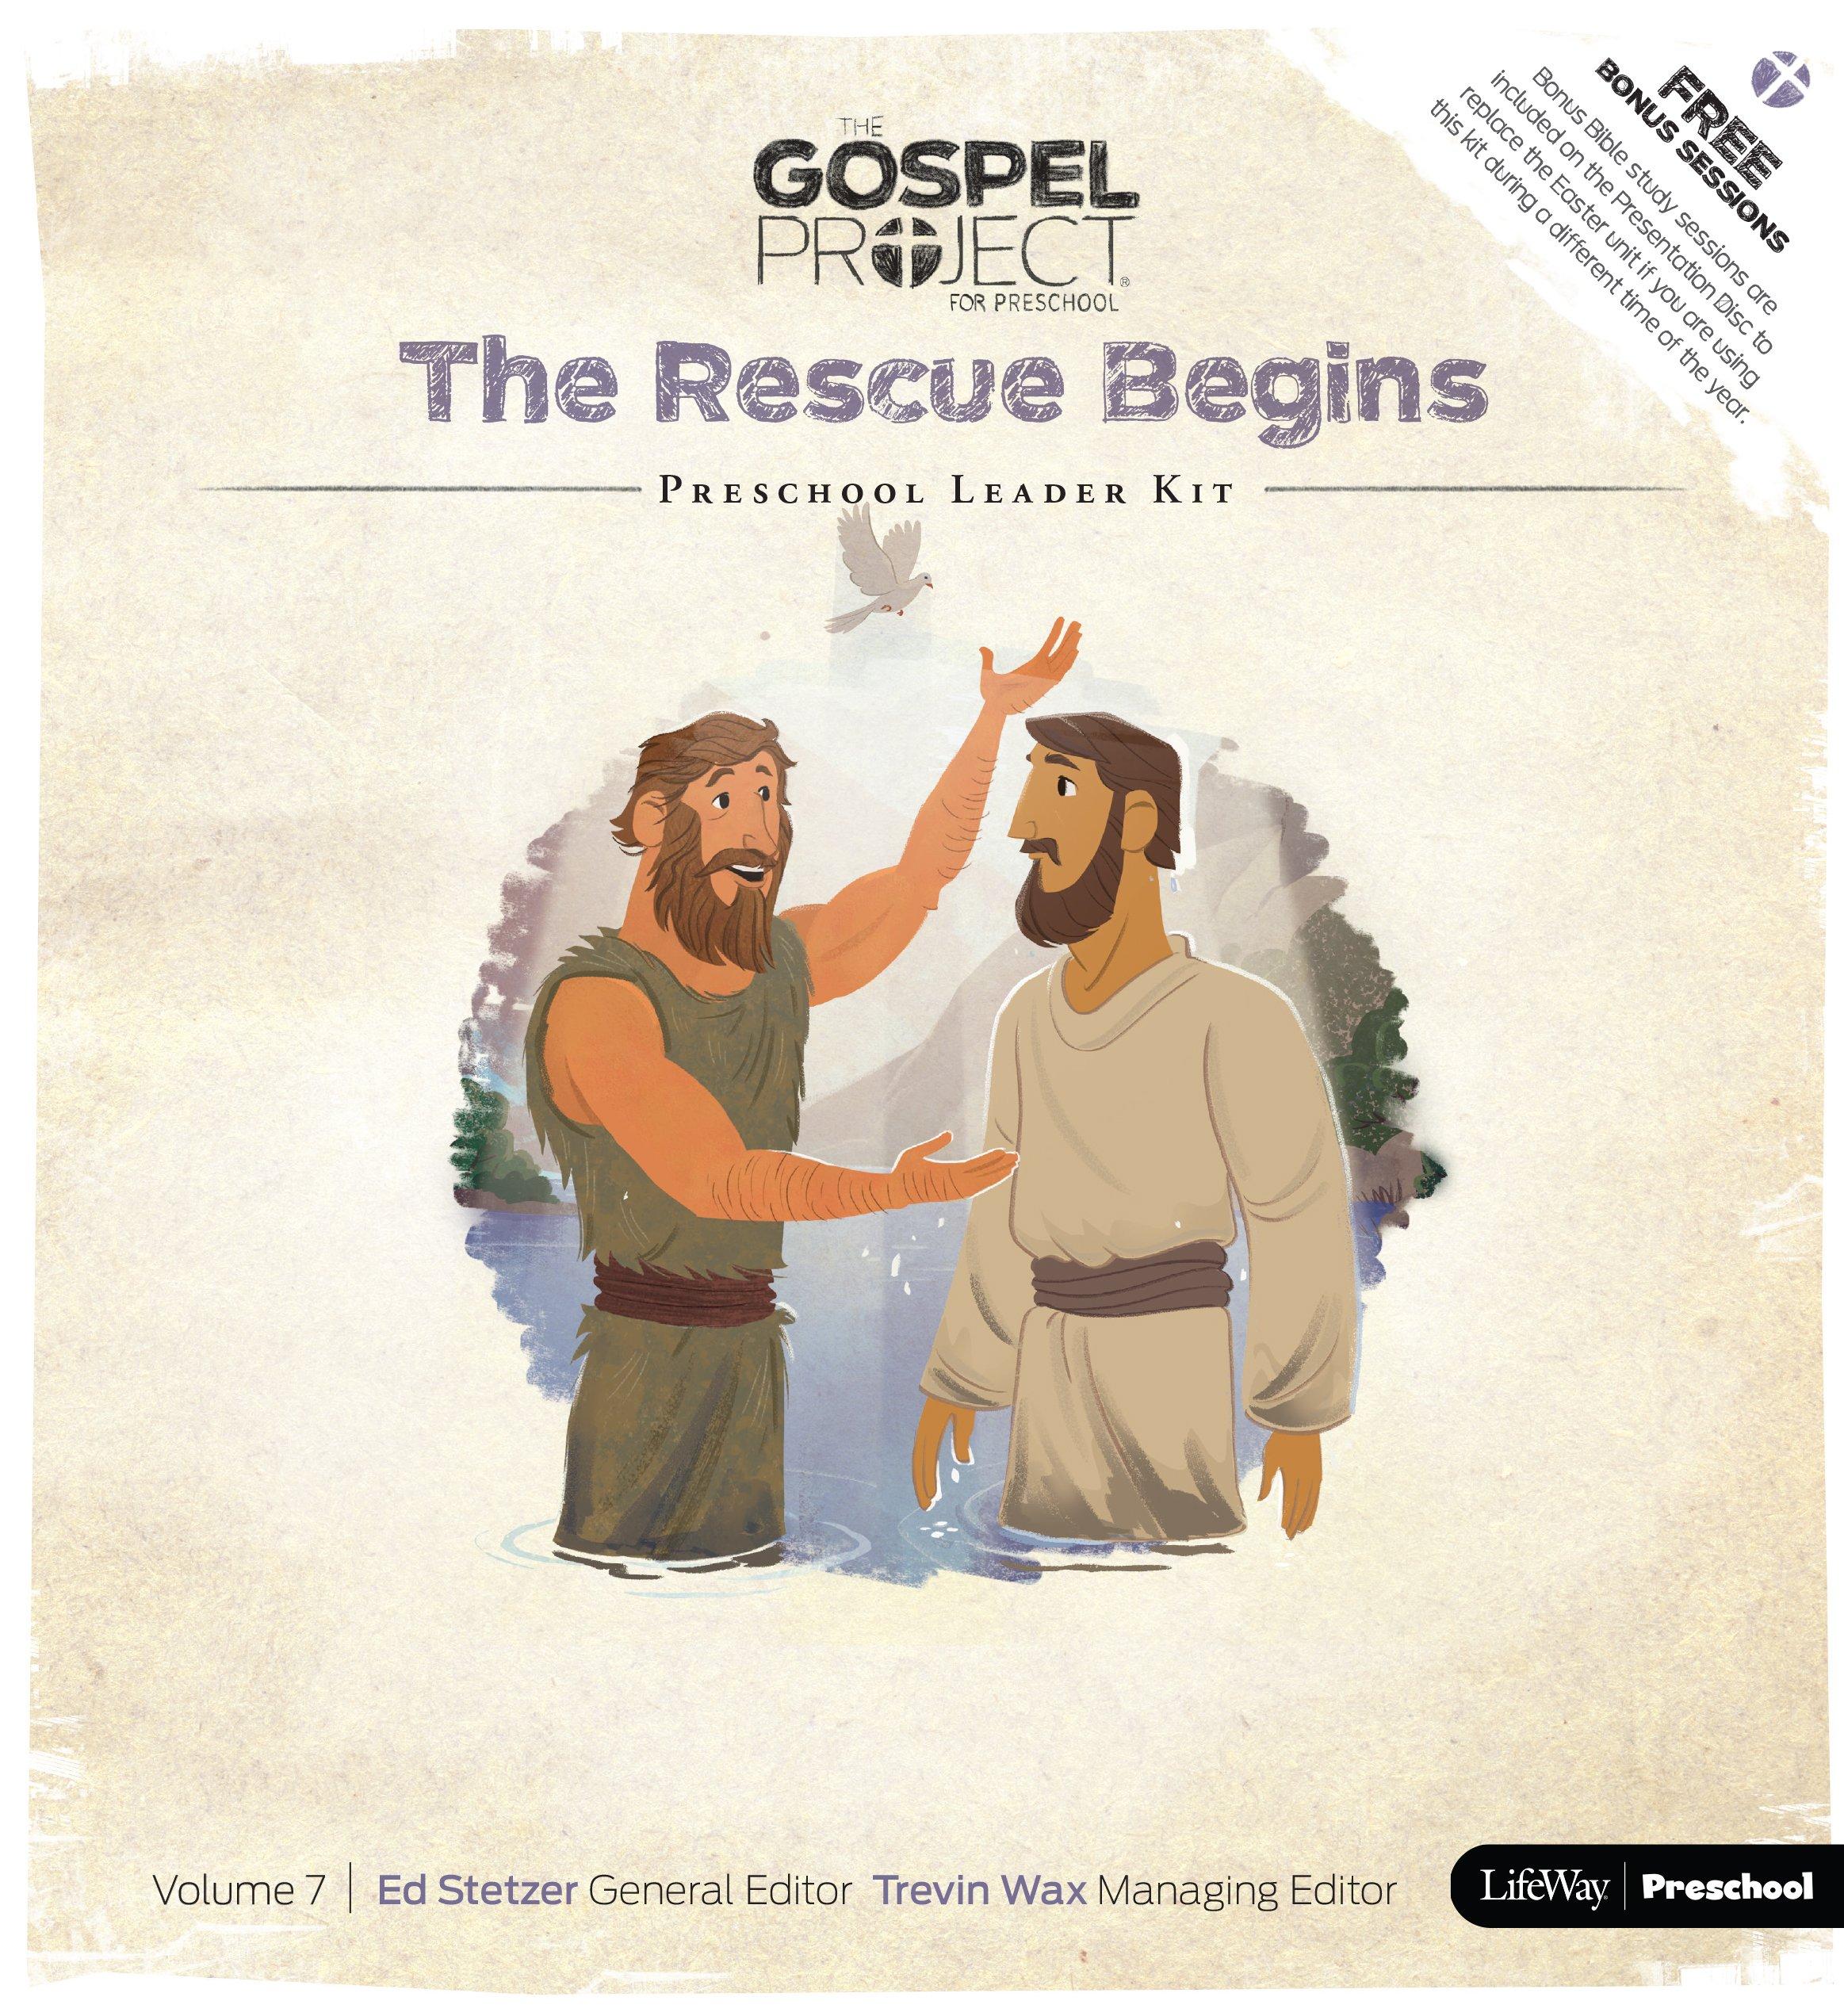 The Gospel Project for Preschool: Preschool Leader Kit - Volume 7: The Rescue Begins ebook